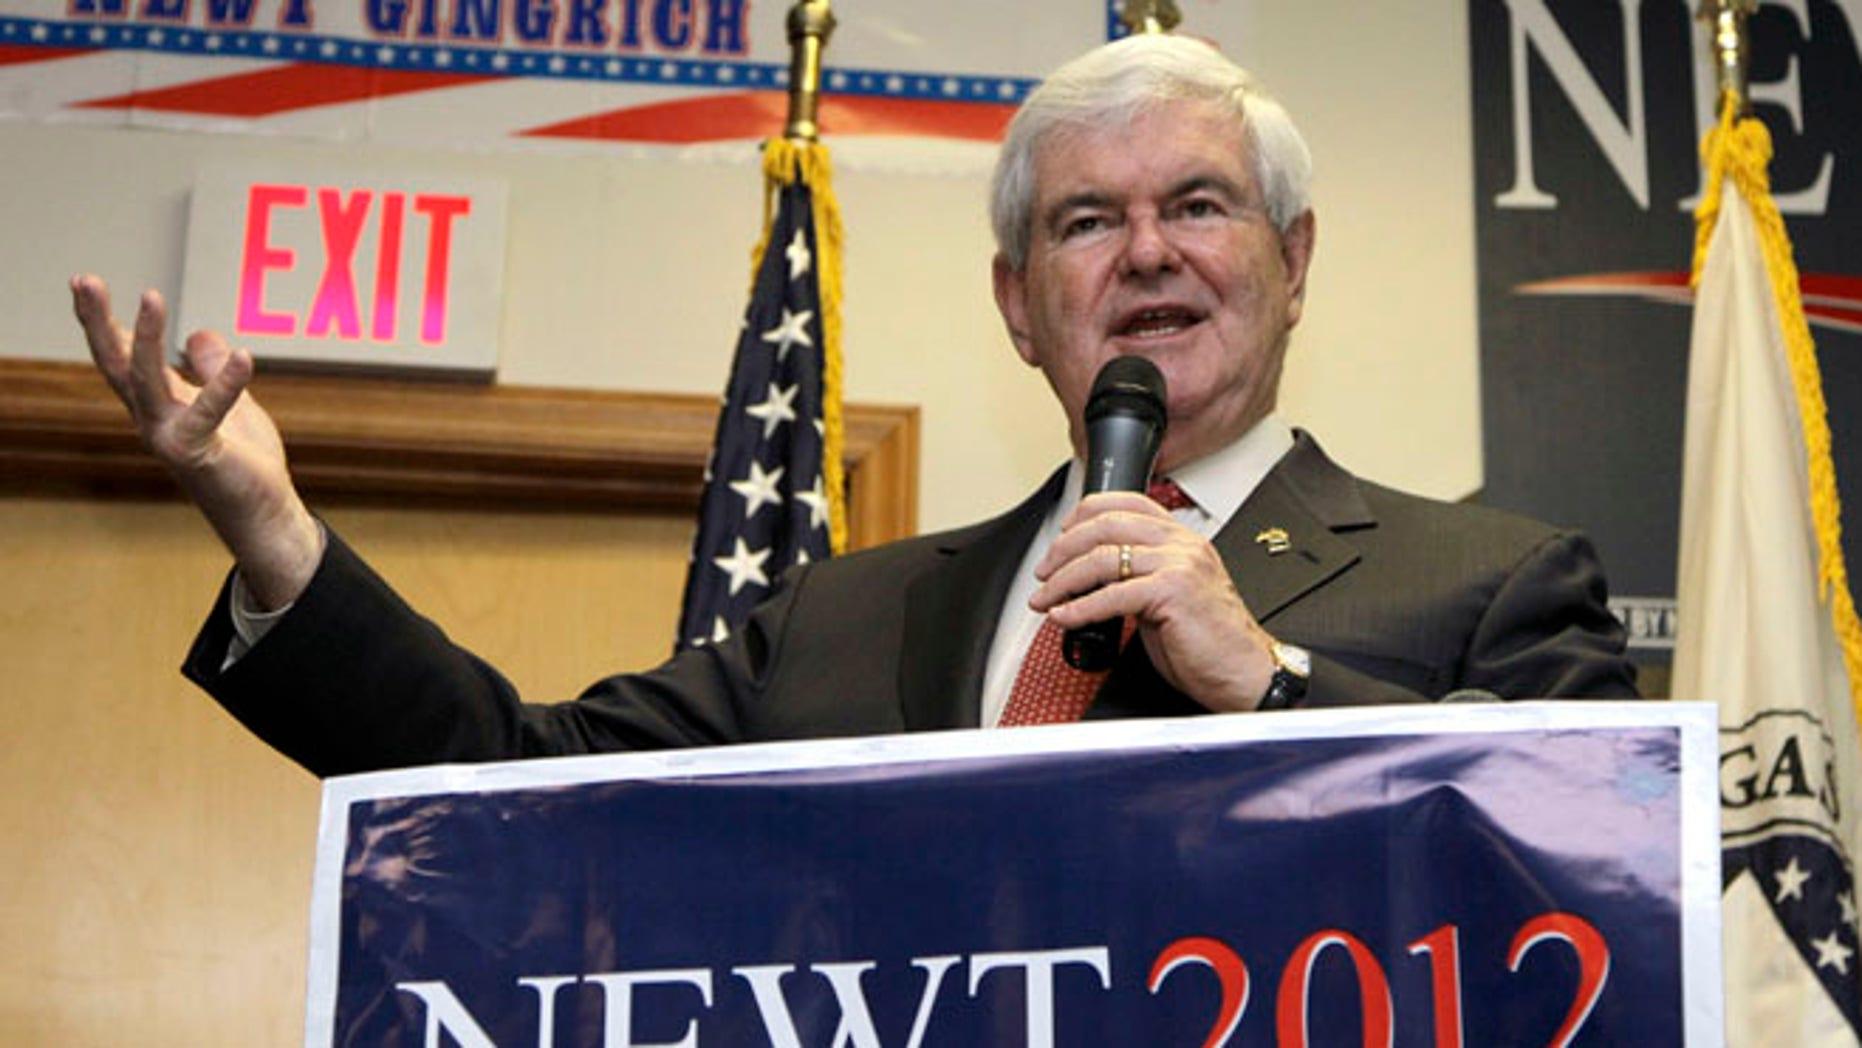 April 25, 2012: Newt Gingrich speaks in Cramerton, N.C.